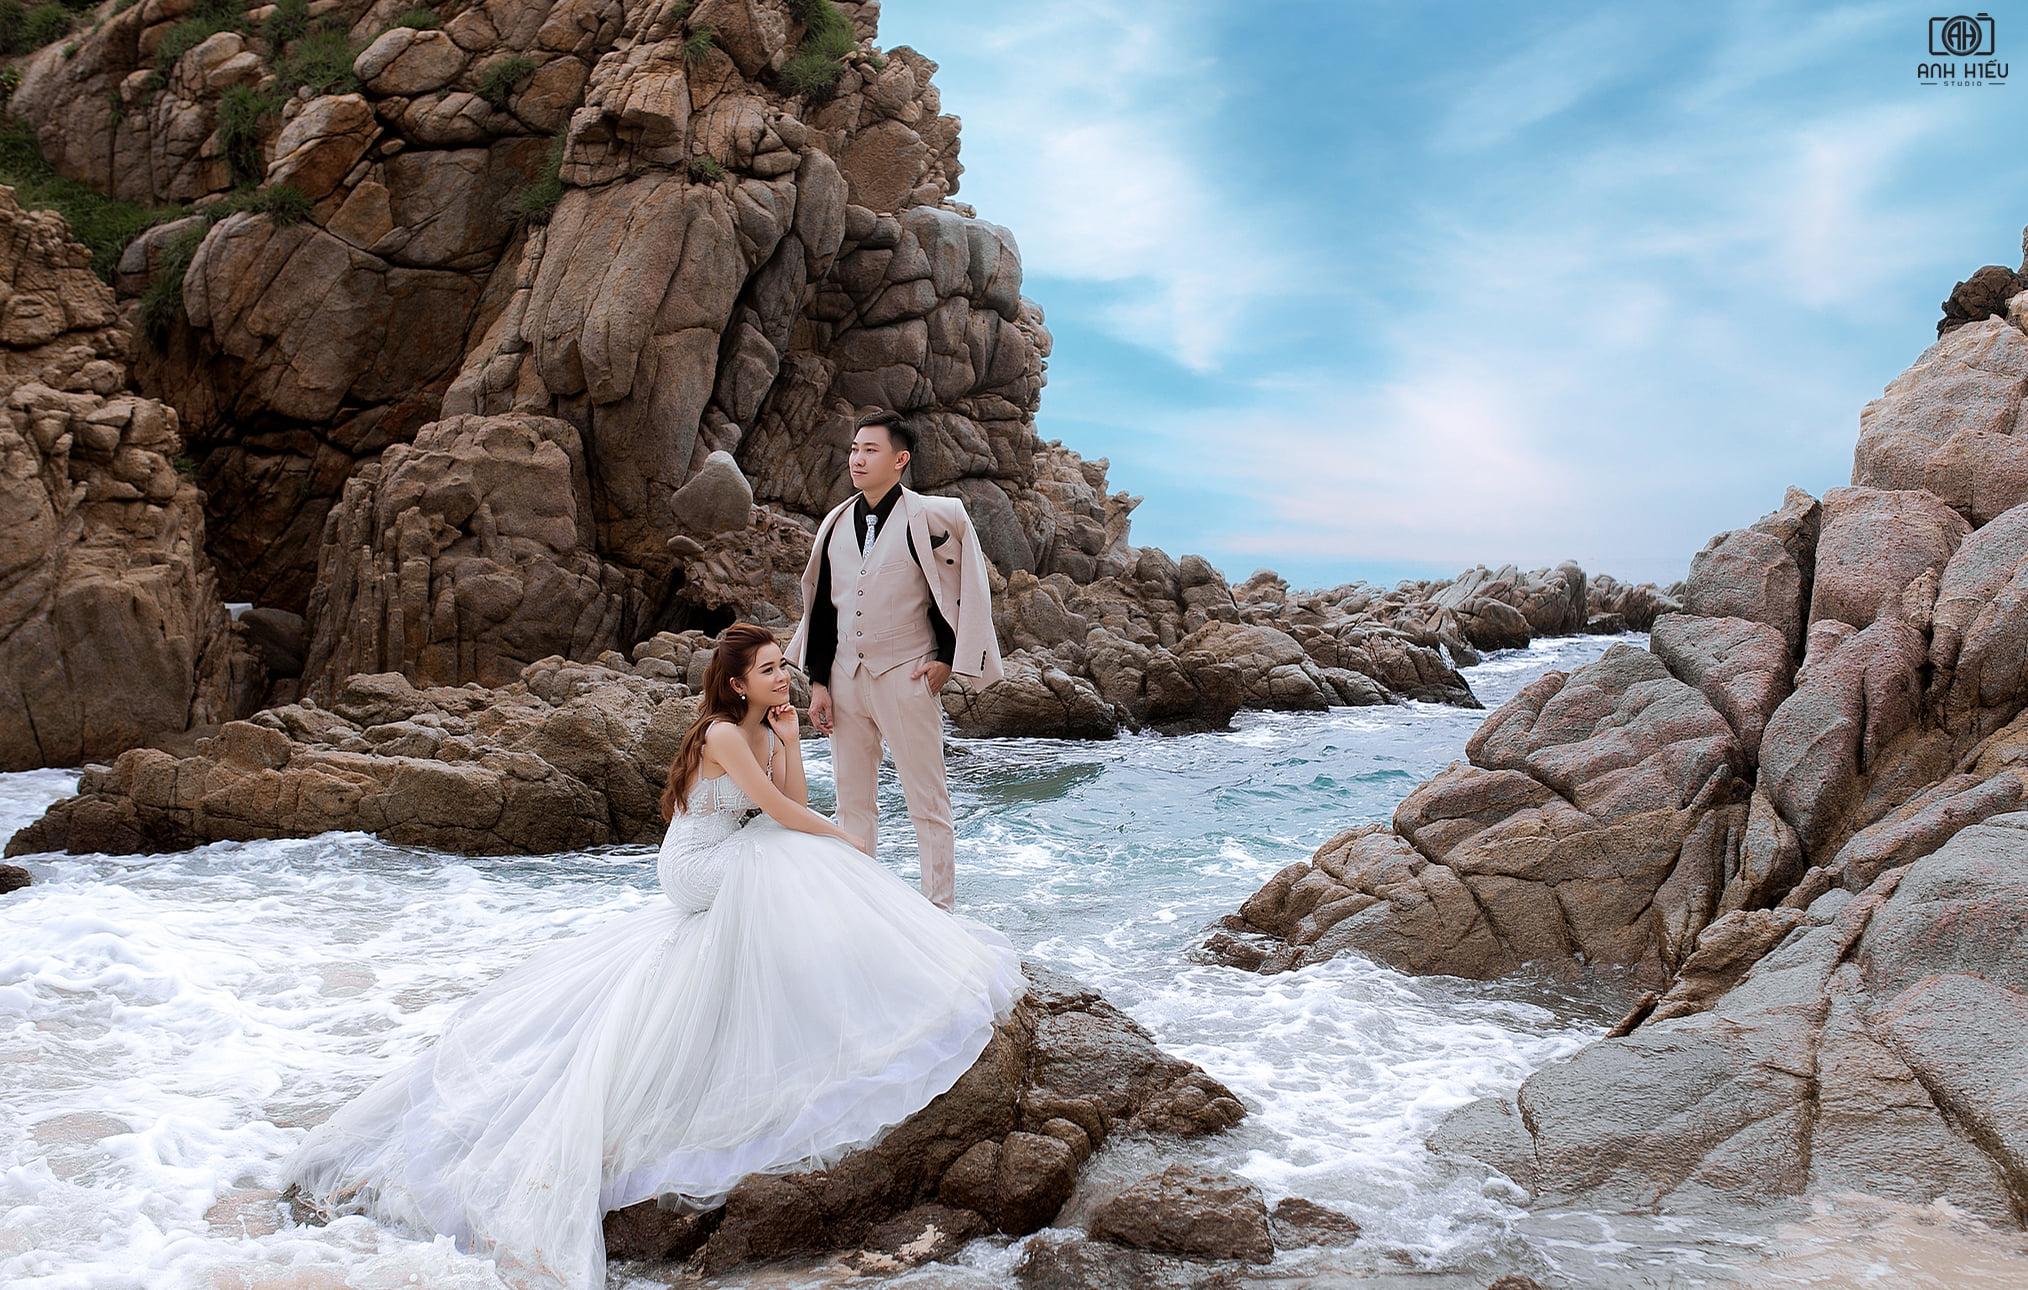 Hinh Cuoi Vinh Hy (5)